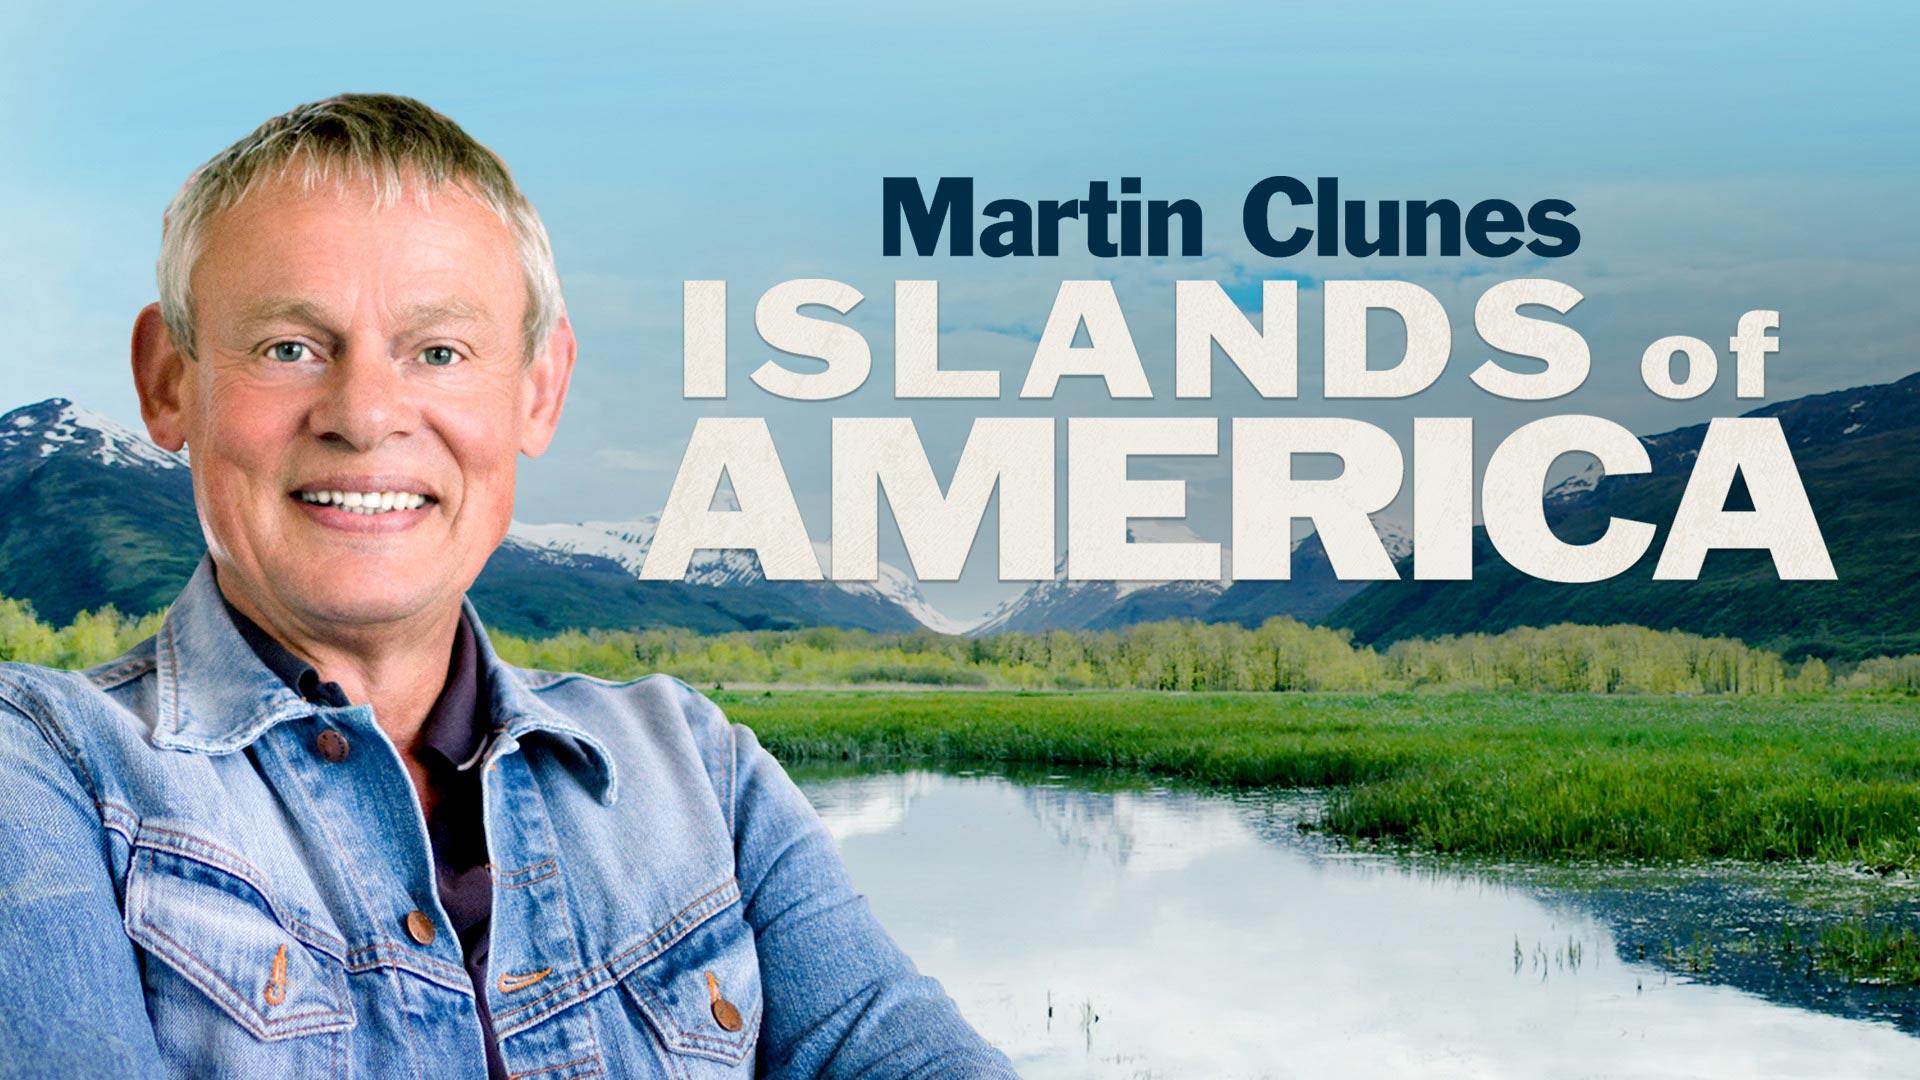 Martin Clunes' Islands of America